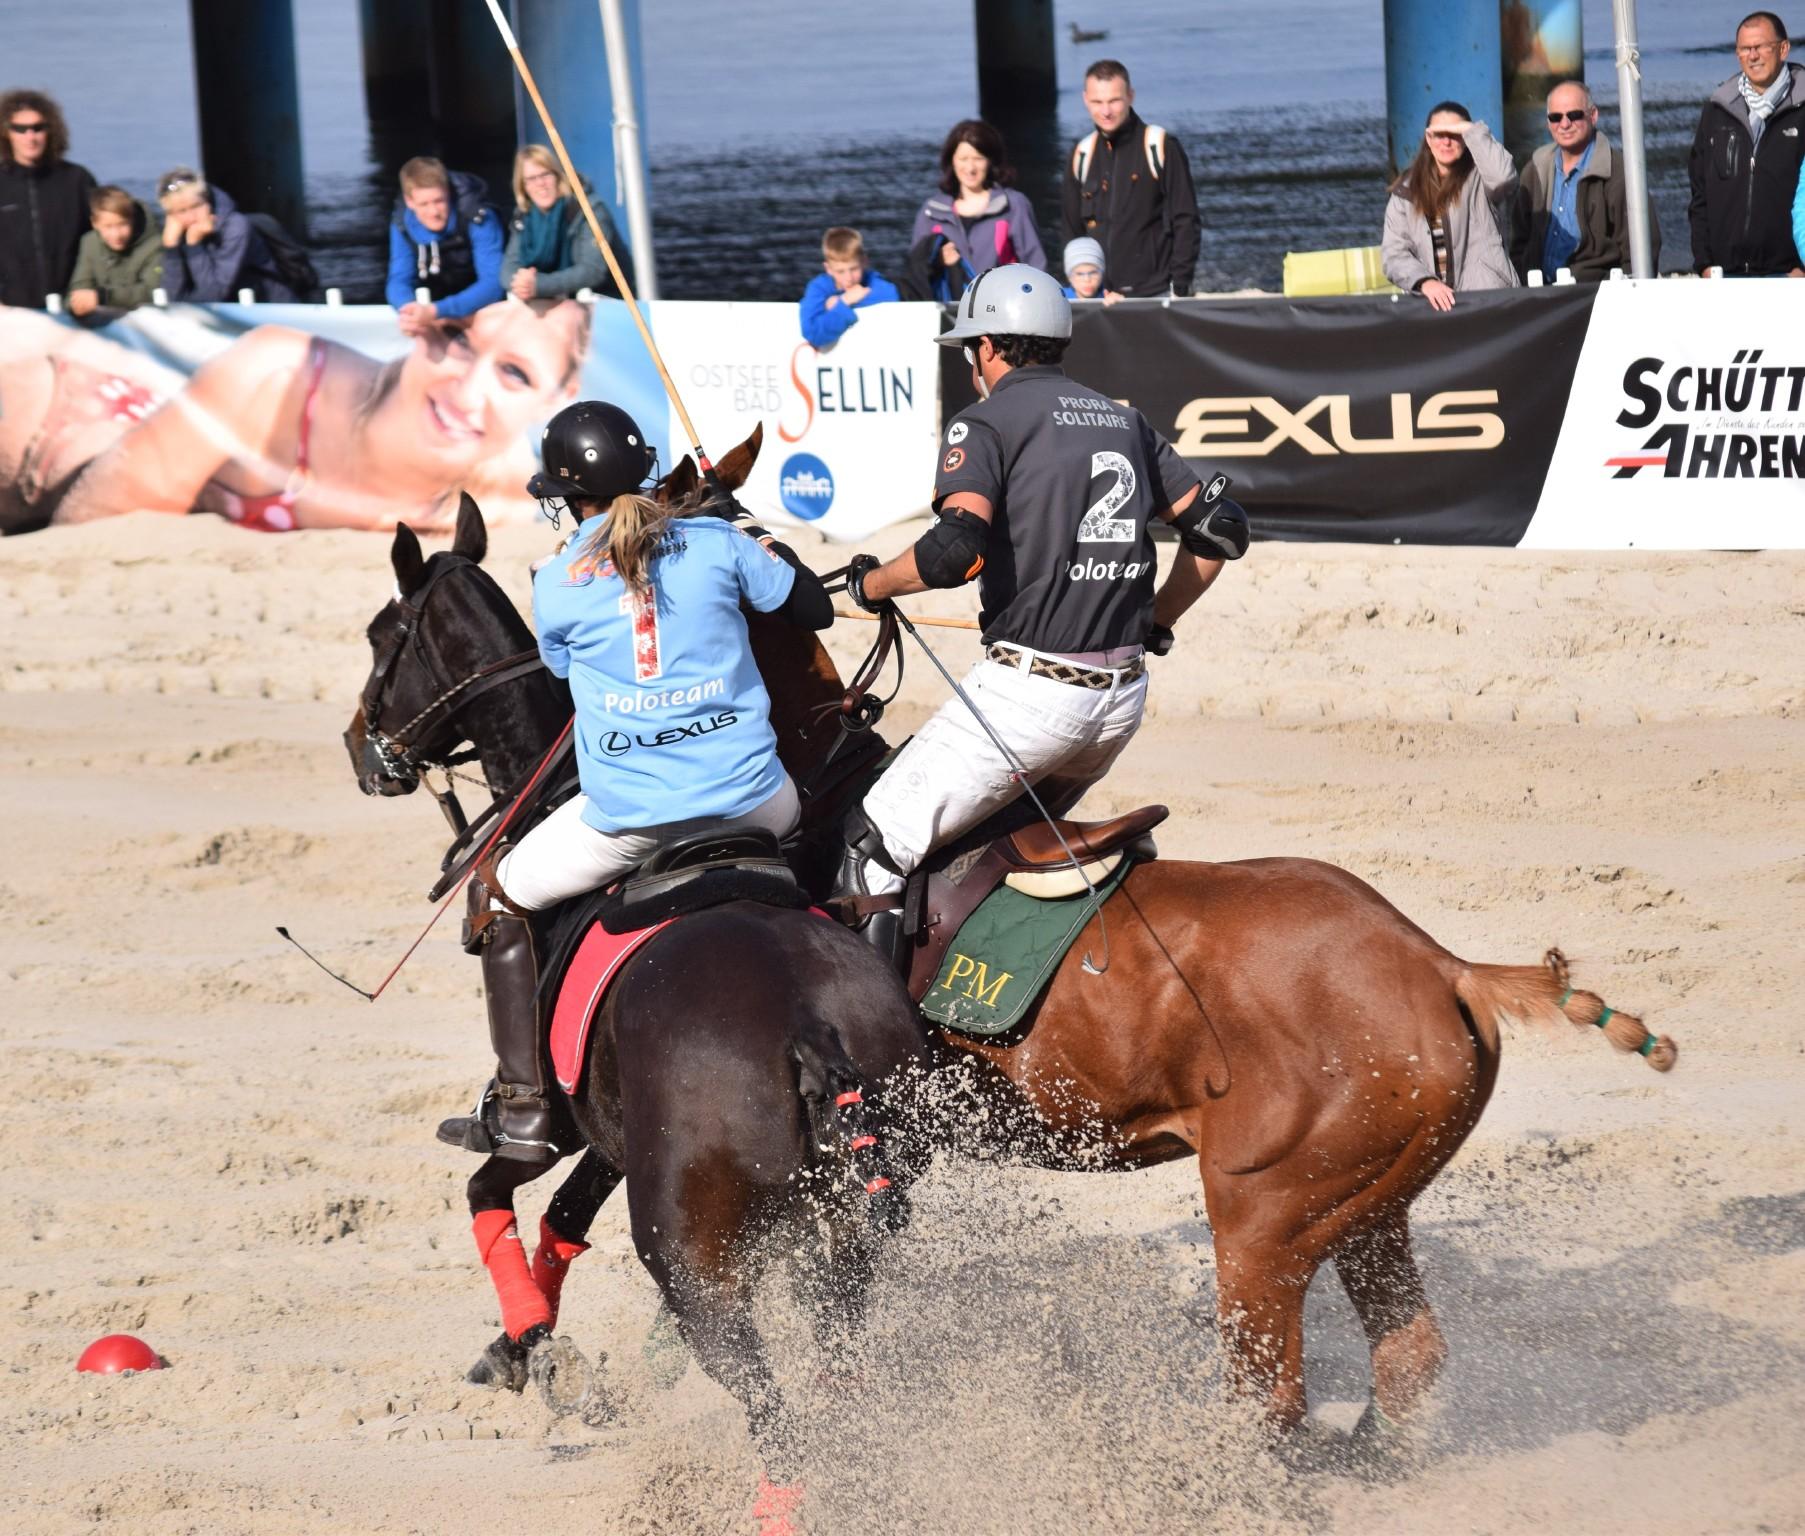 Prora Solitaire 8 German Beach Polo Championship Sellin Rügen 7 JPG